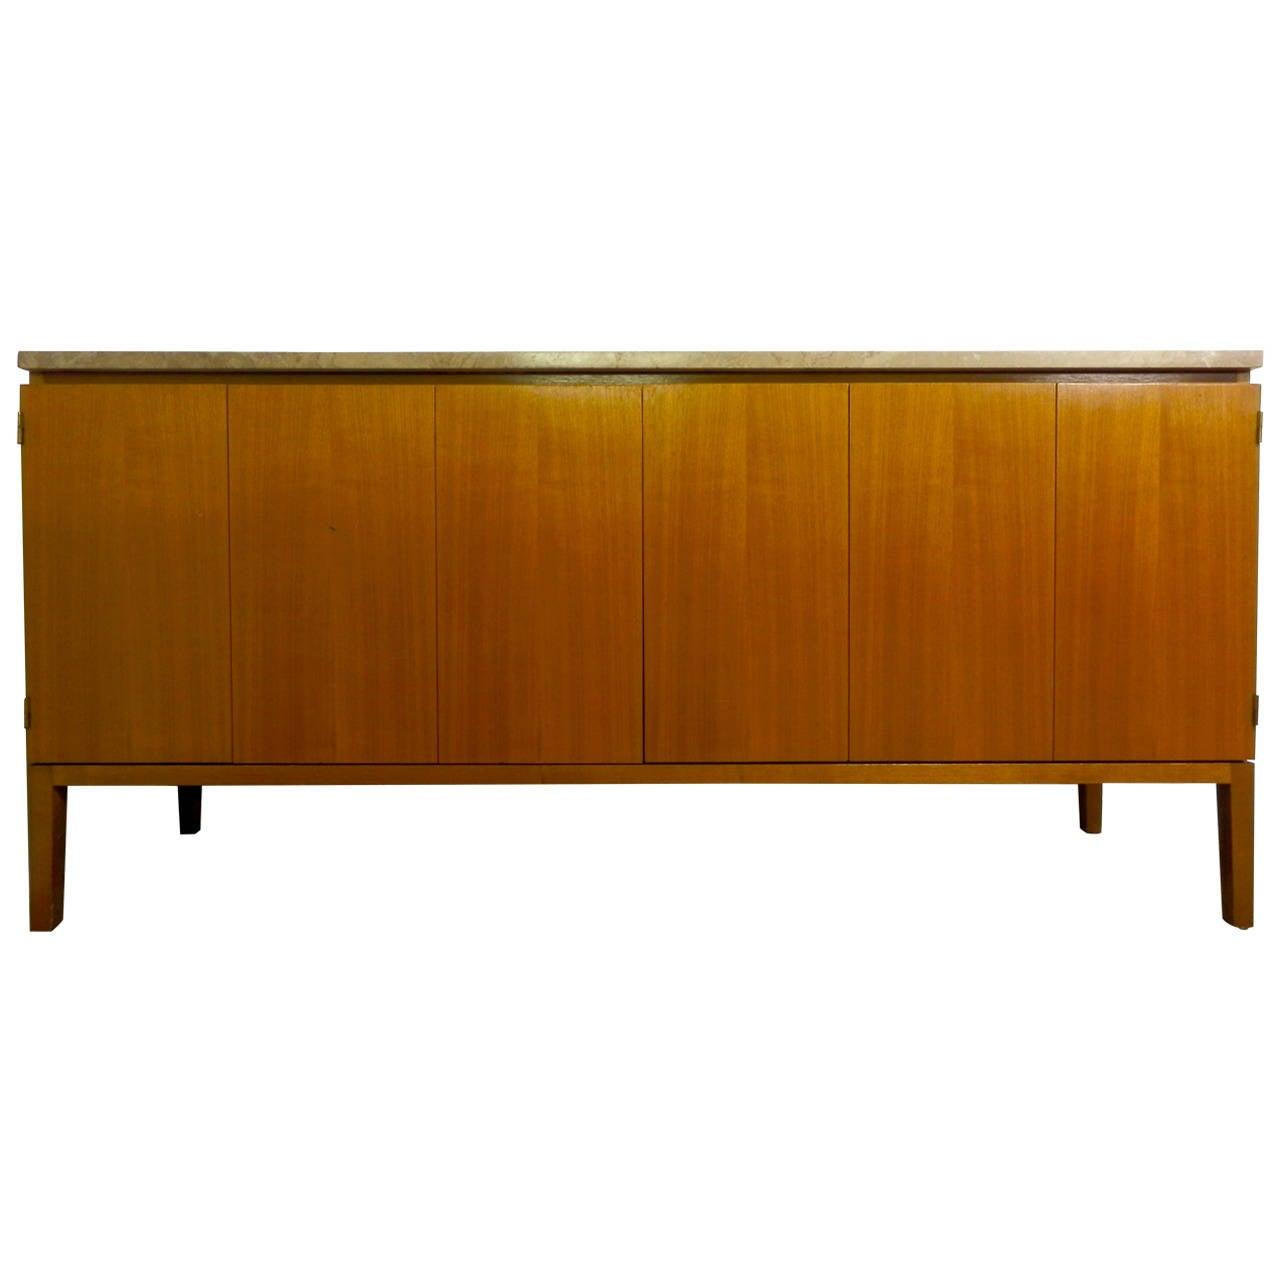 Rare Paul McCobb Sideboard